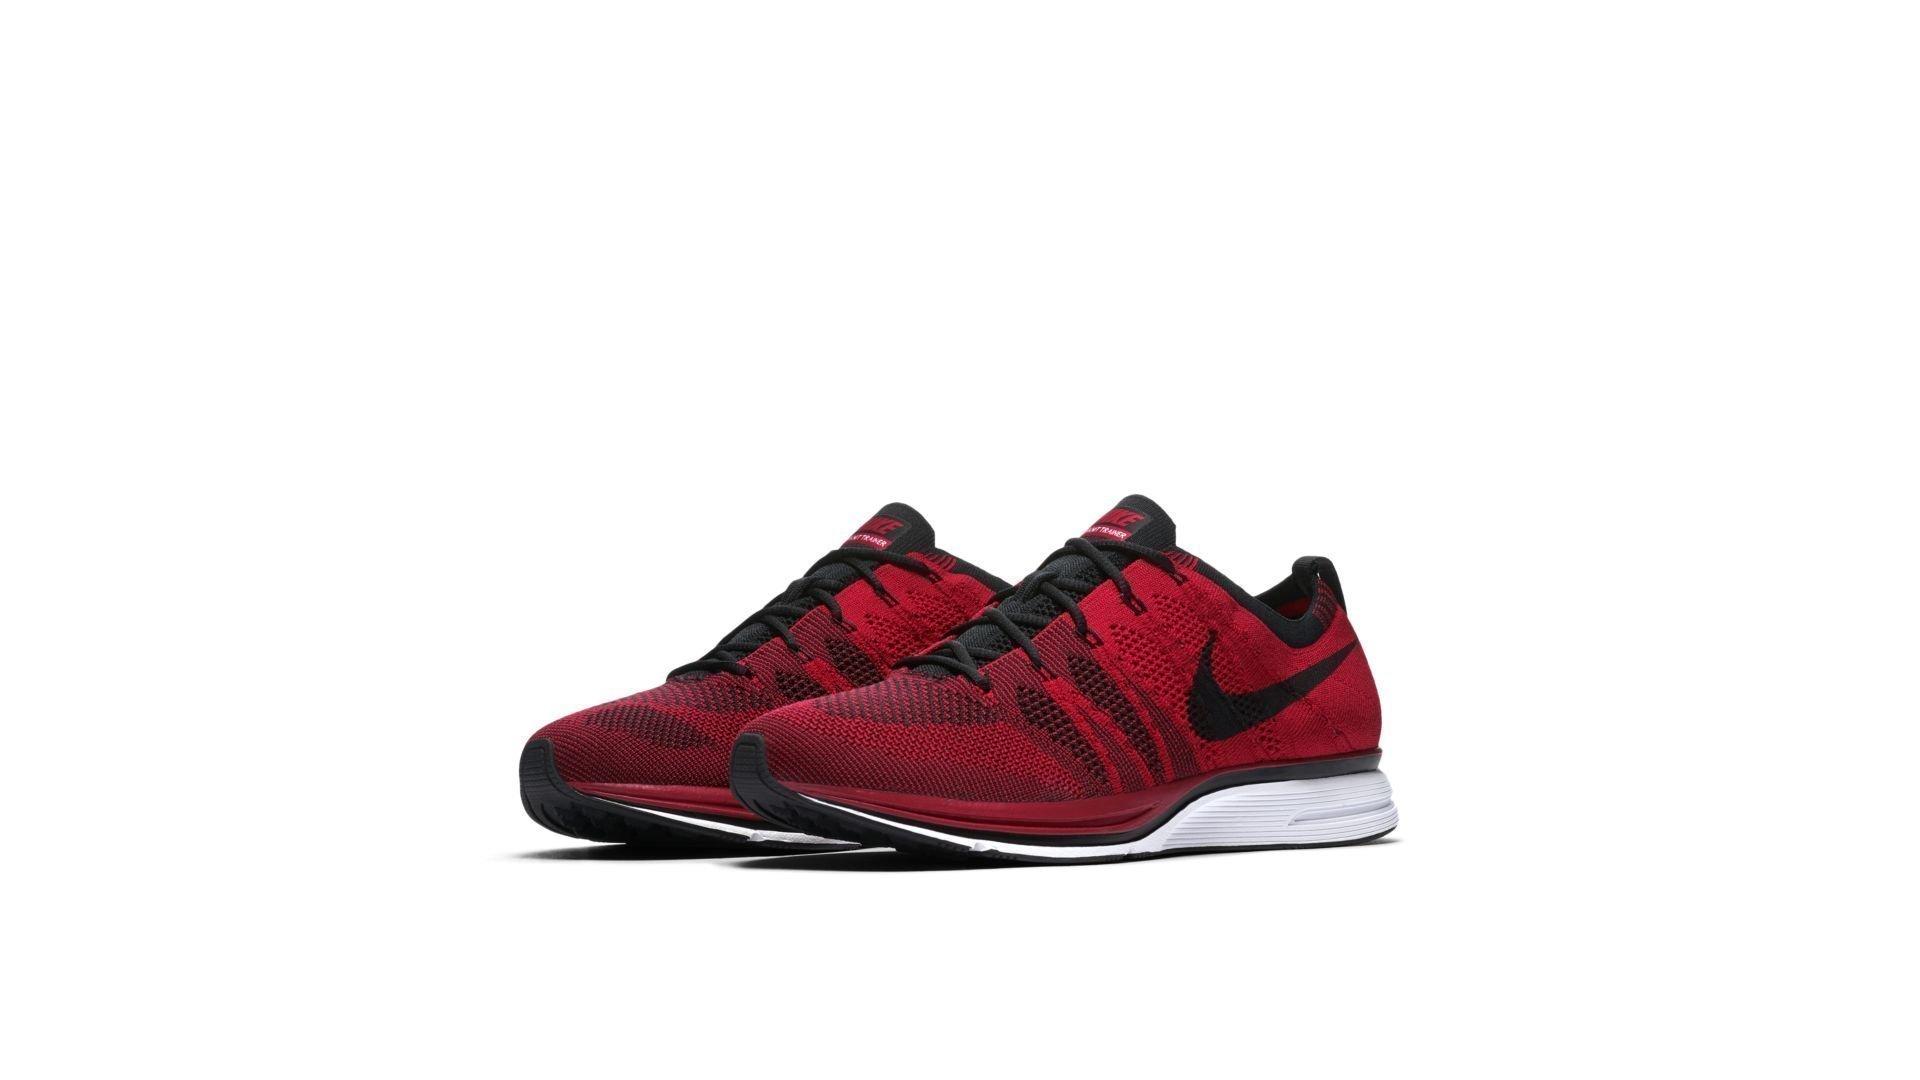 Nike Flyknit Trainer University Red (2018) (AH8396-601)